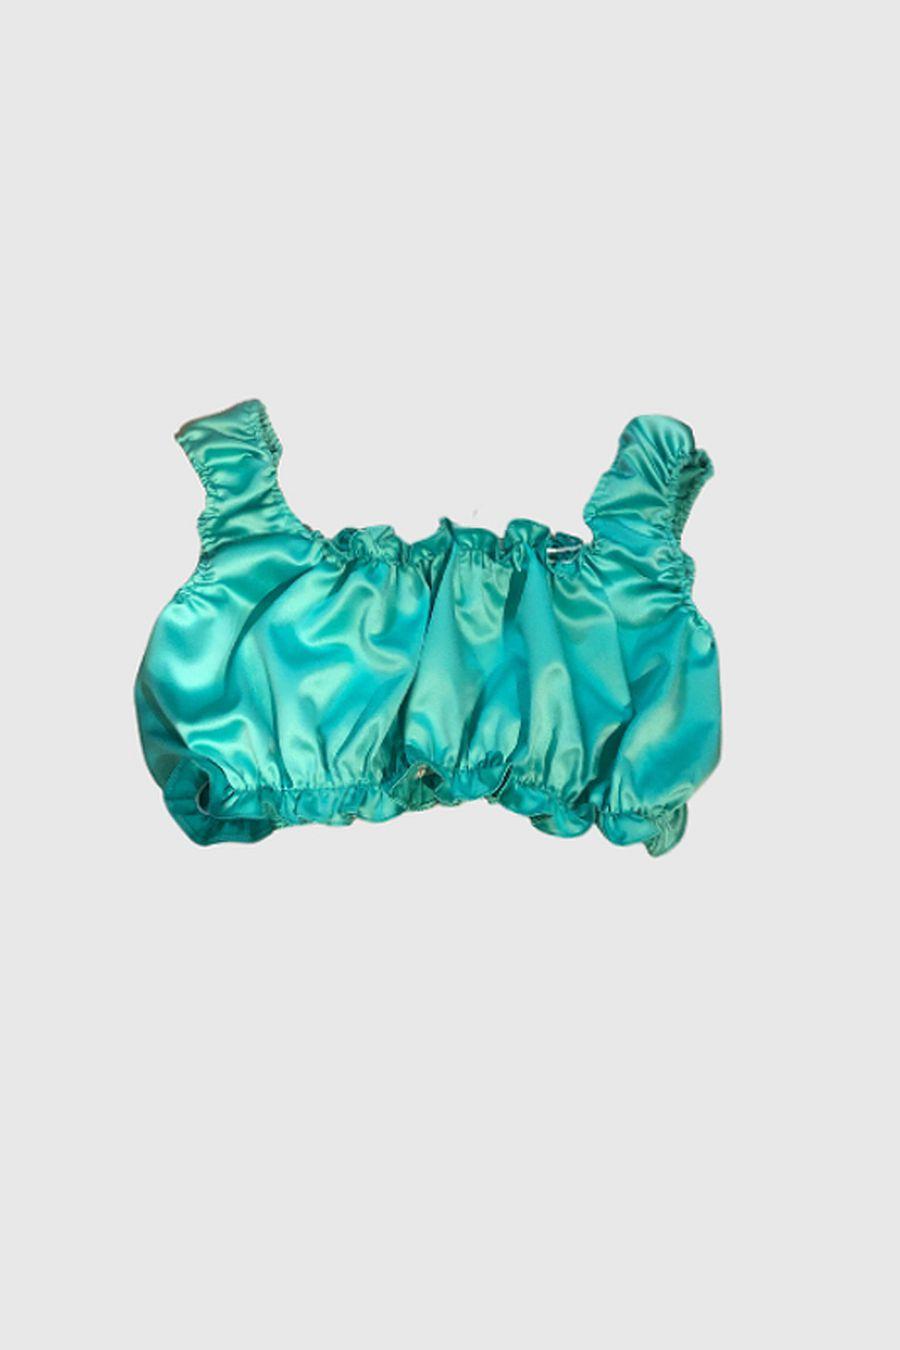 Tach Clothing Goda Silk Top - Aqua